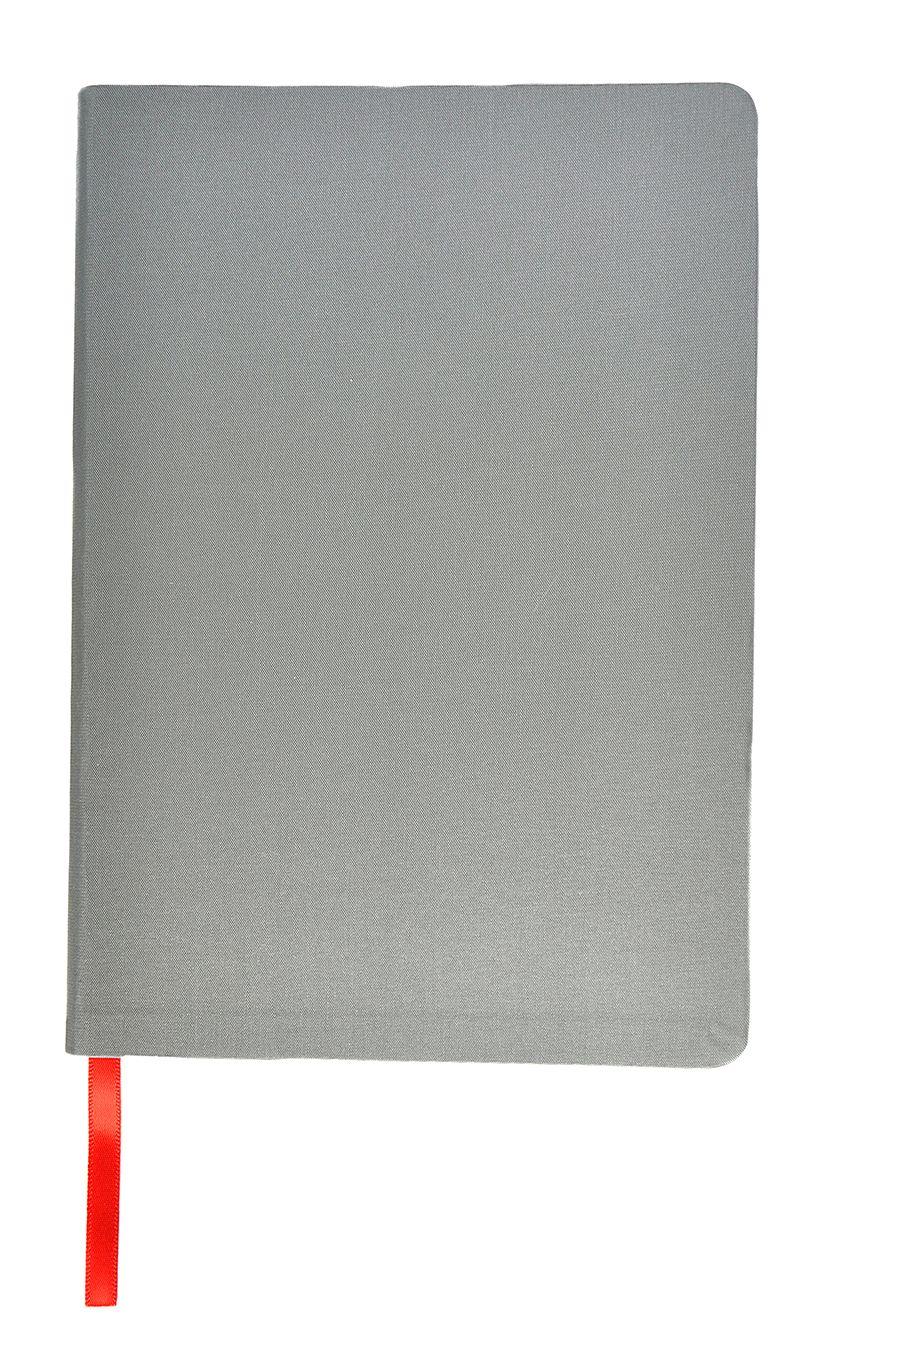 Bio-Degradable Notebook Cover Grey